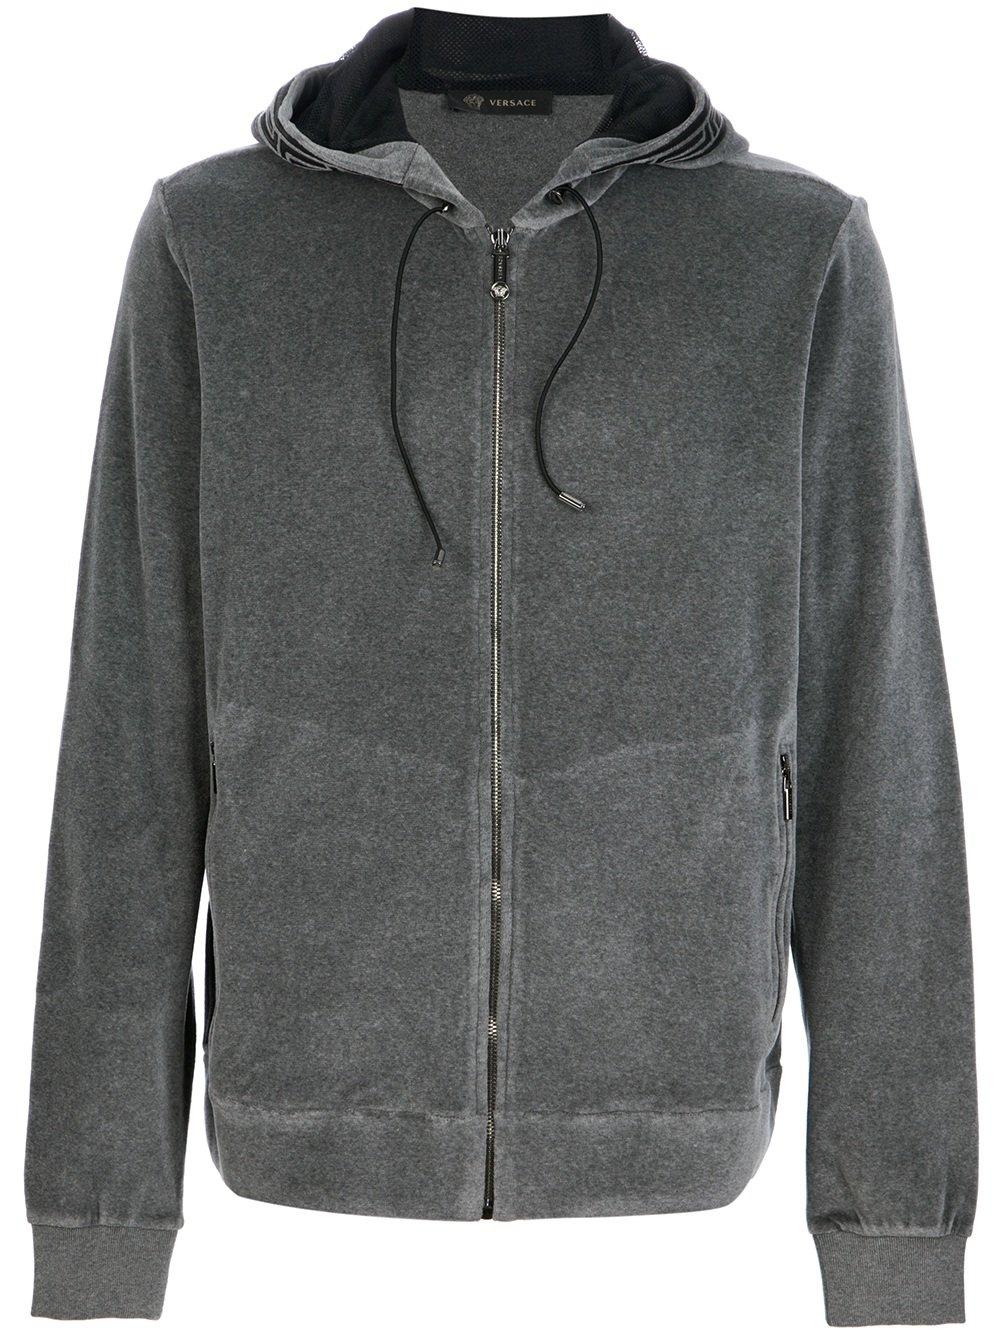 Versace Velour Hoodie in Gray for Men (grey)   Lyst